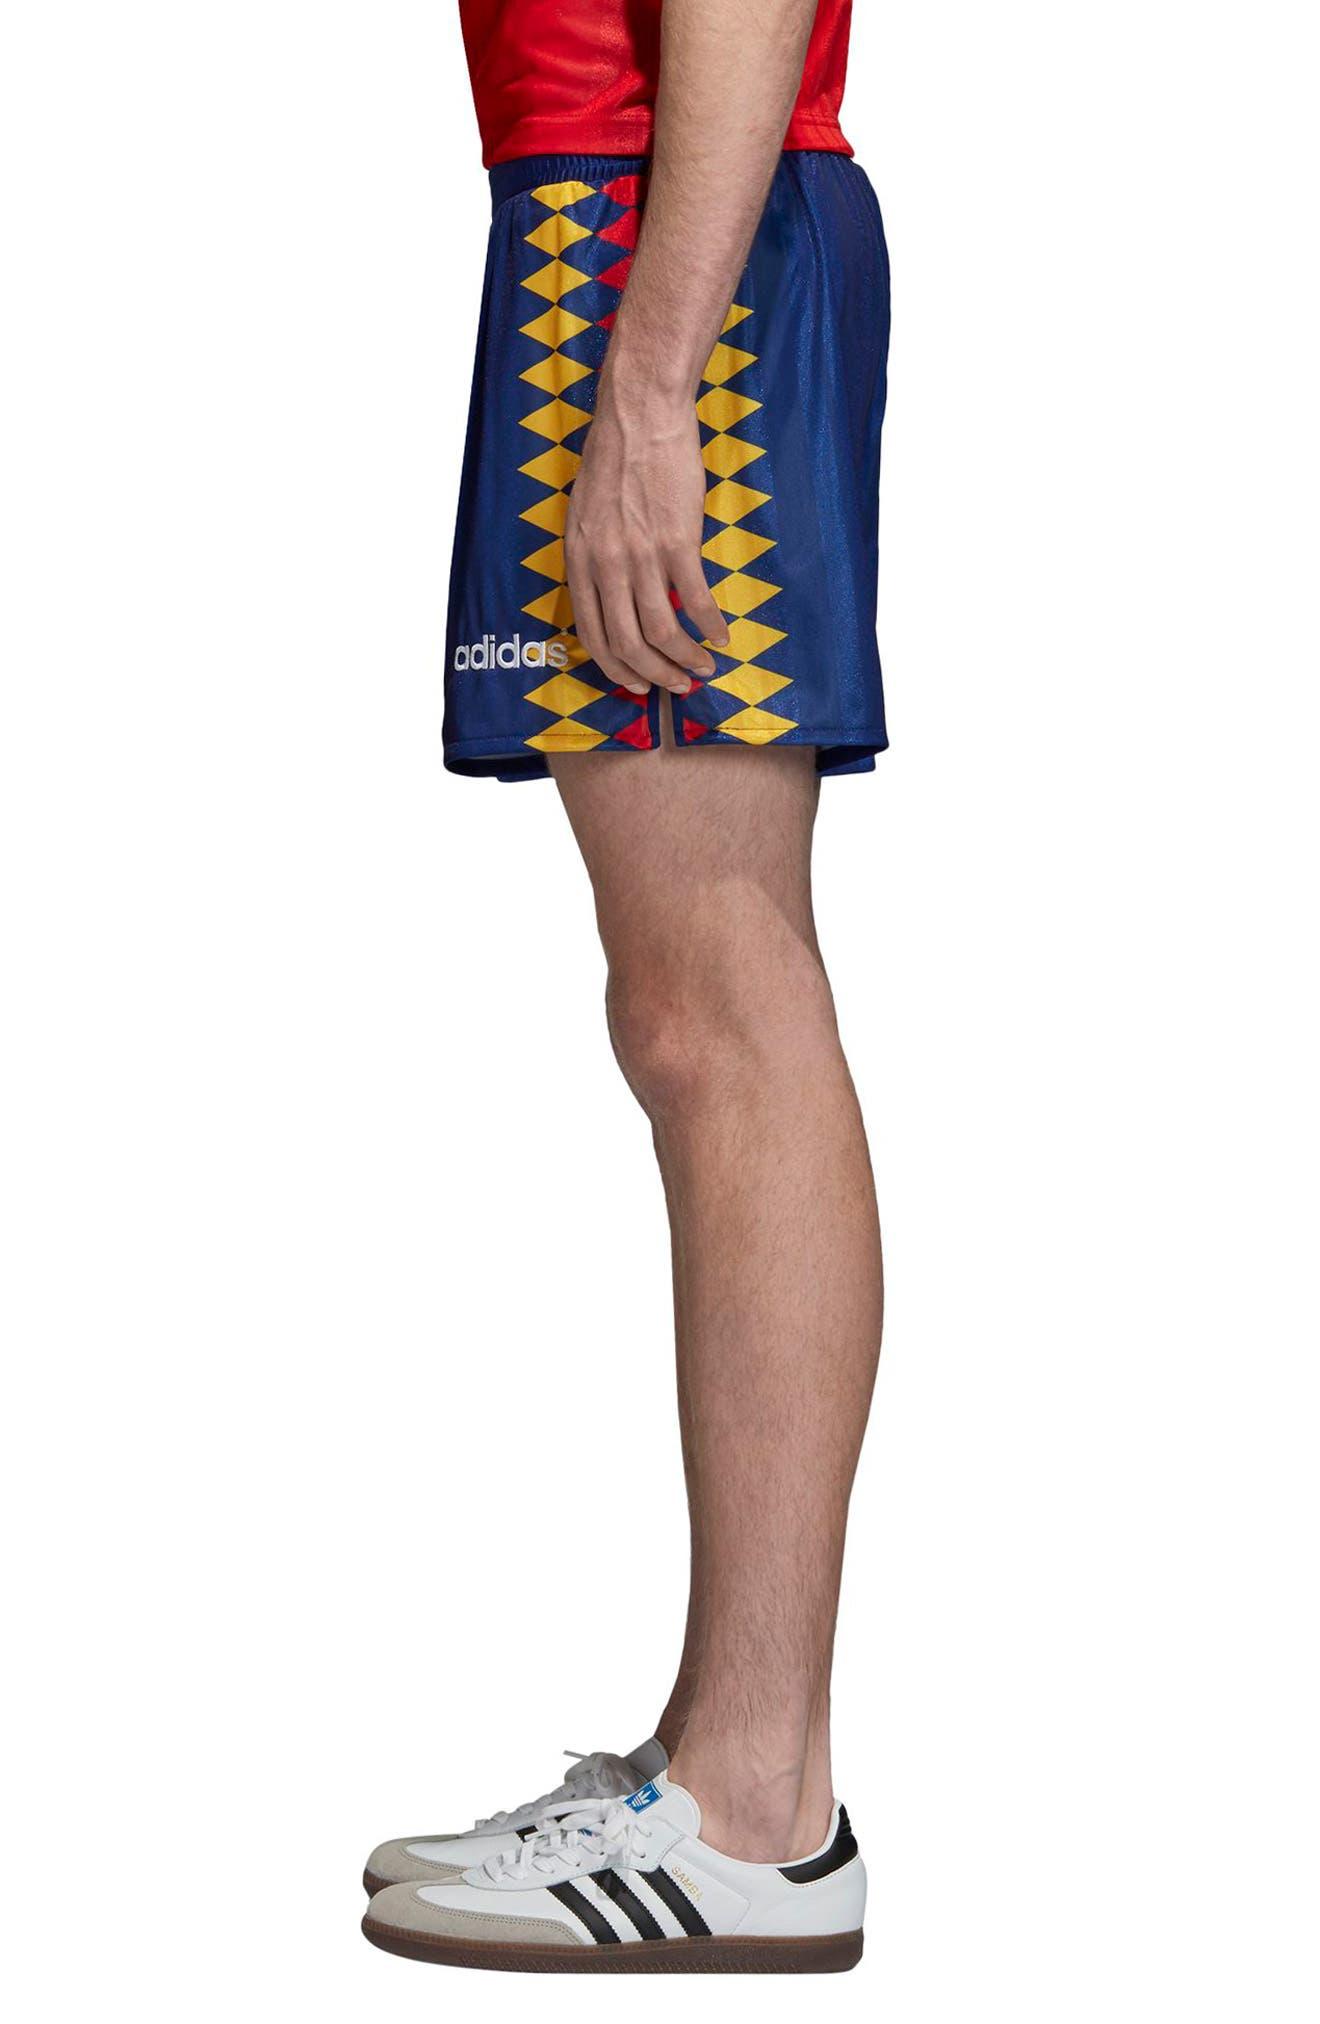 ADIDAS ORIGINALS,                             adidas Original Spain 1994 Shorts,                             Alternate thumbnail 3, color,                             414